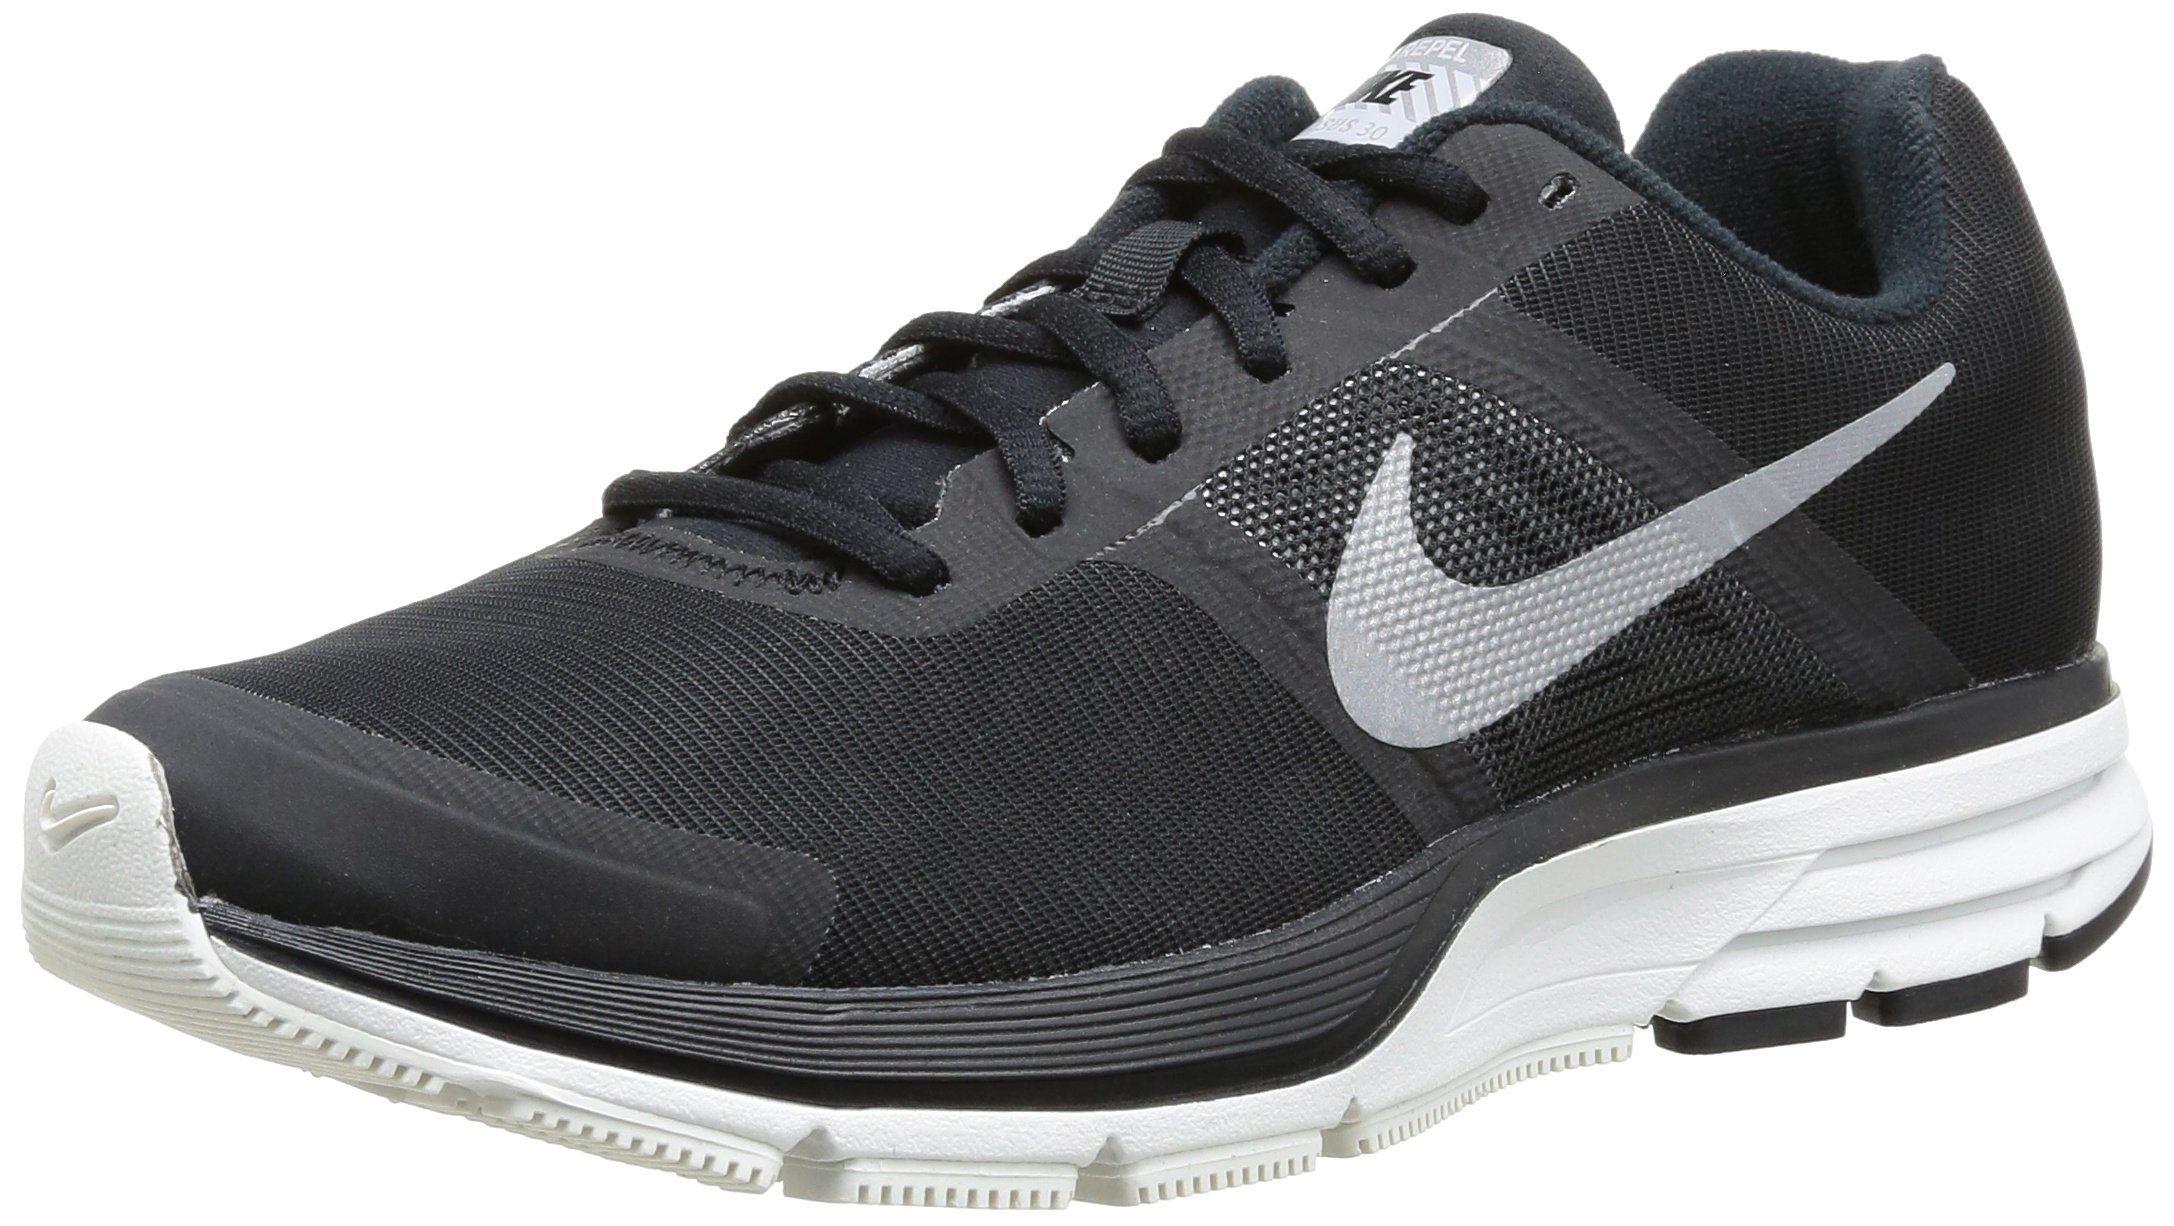 34bc6bd29c3 Nike Air Pegasus 30+ Shield Mens Running Shoes